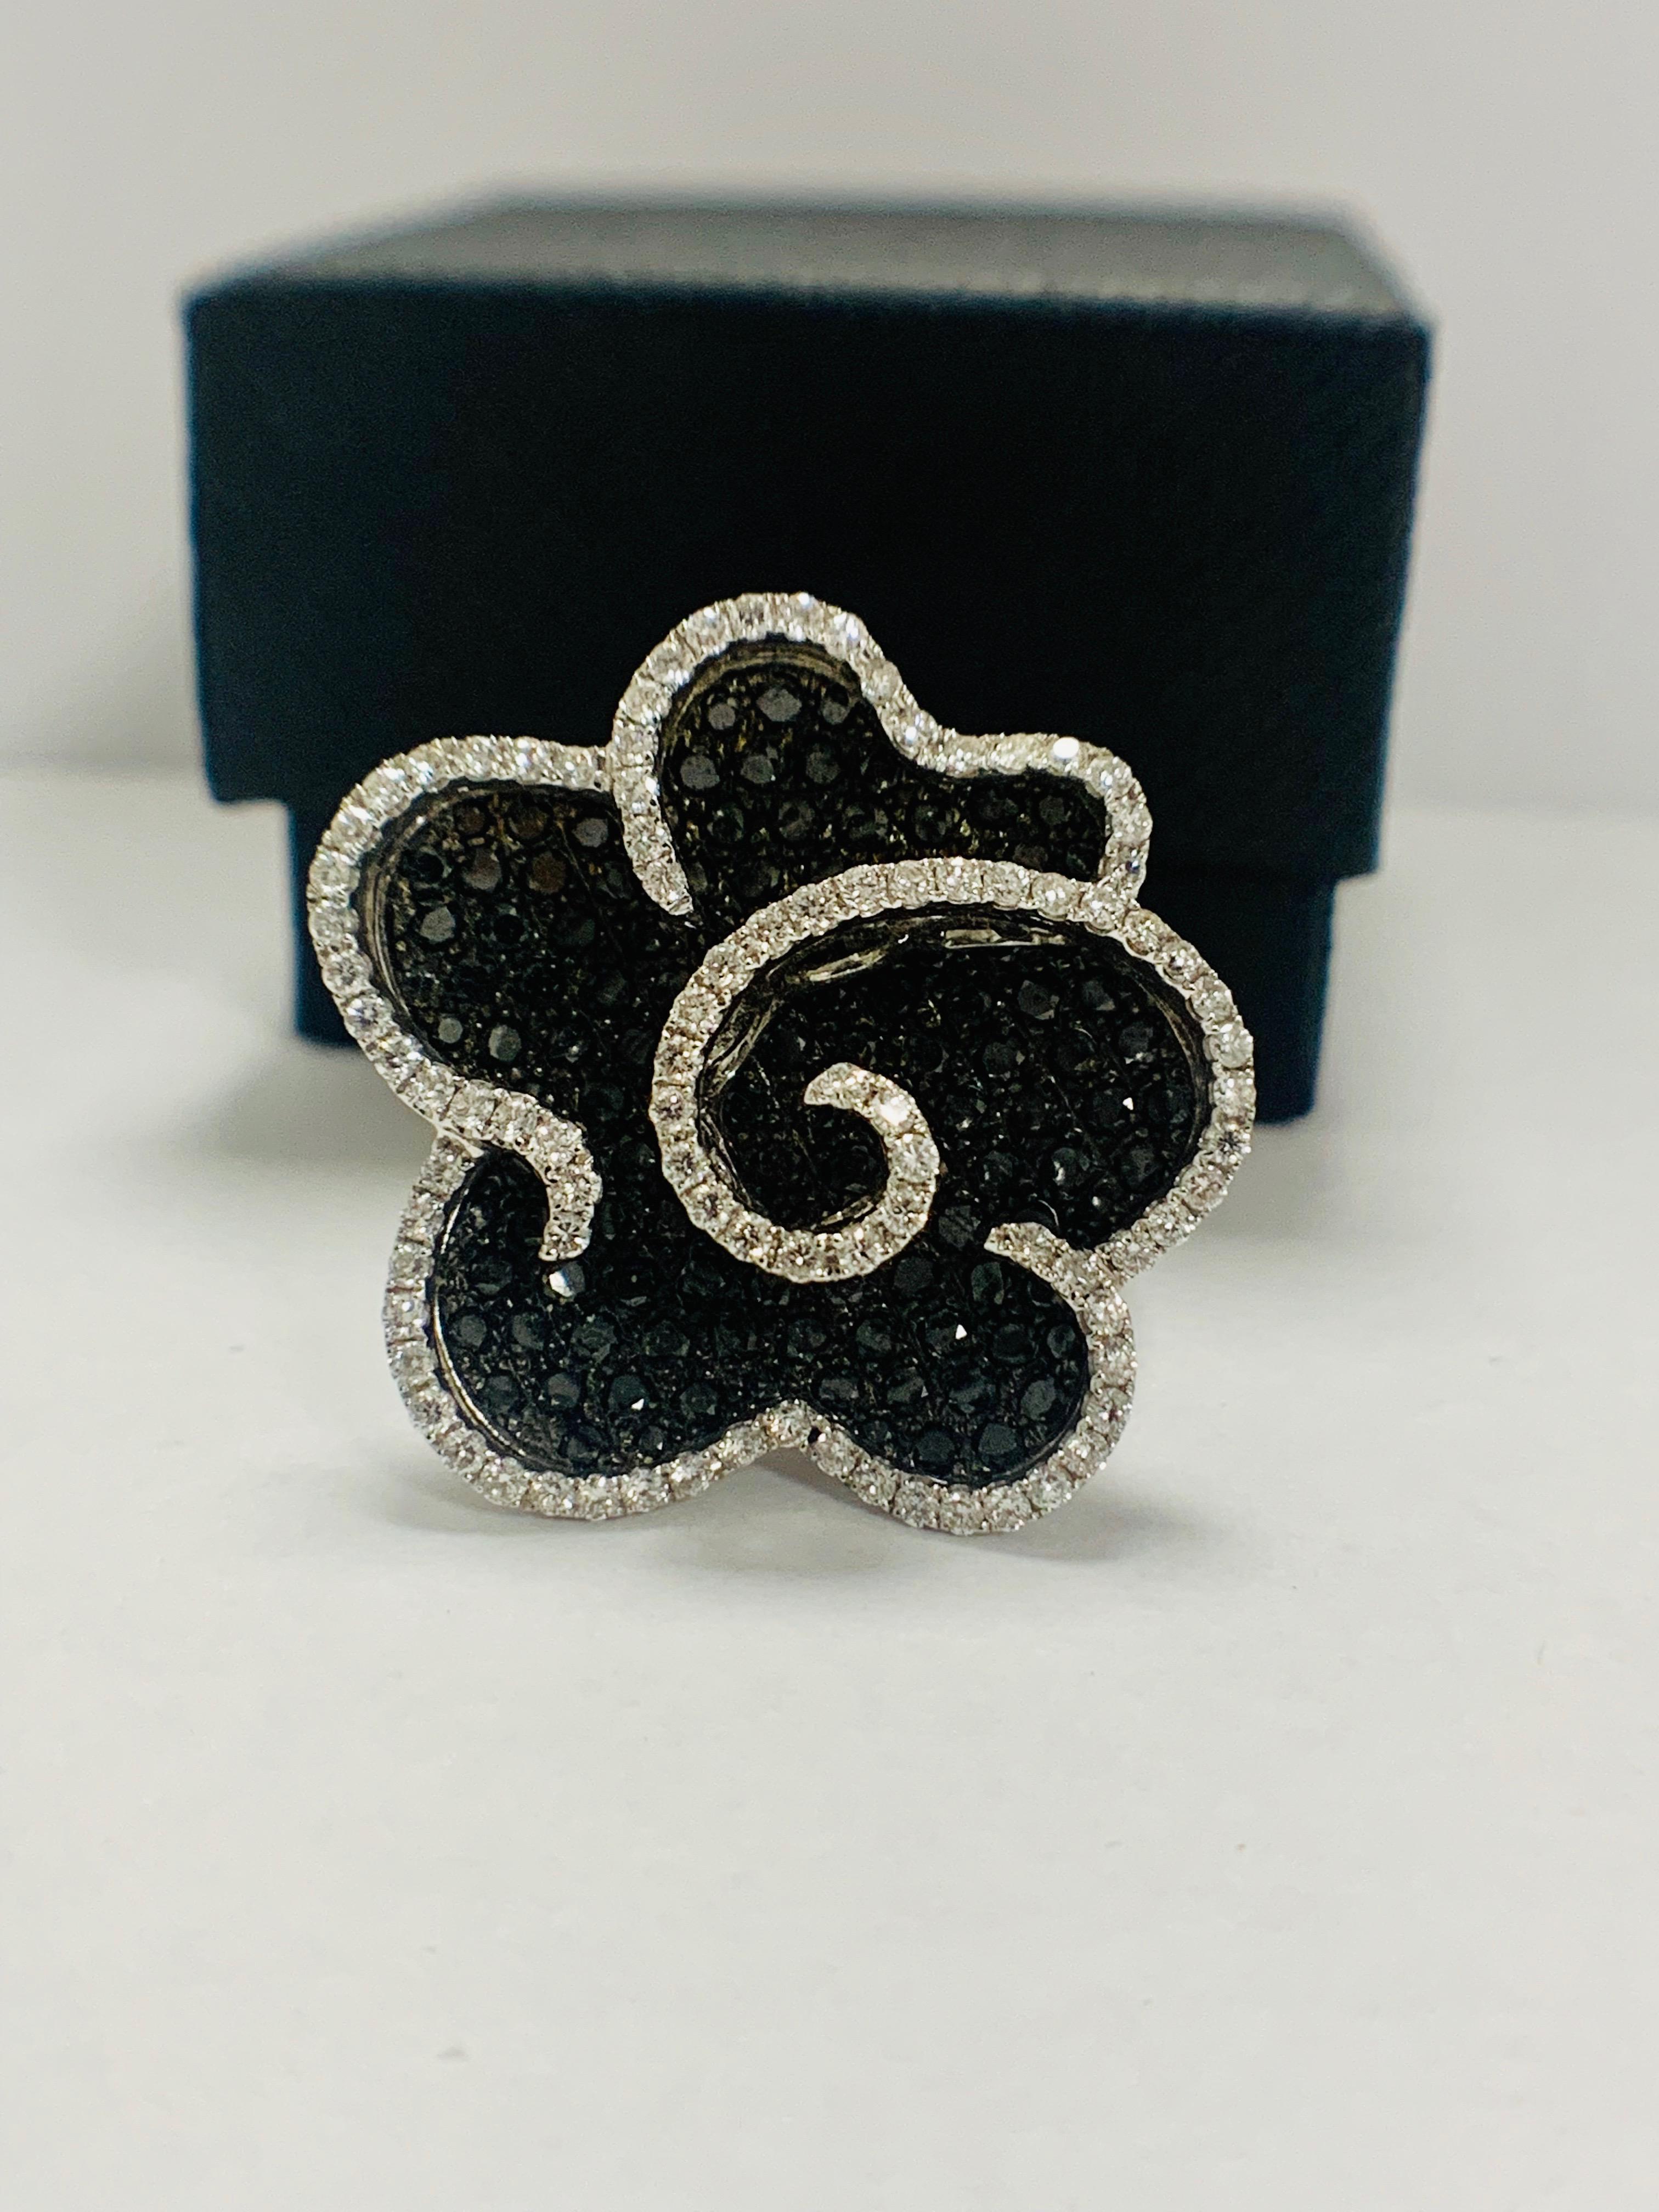 18ct White Gold Diamond flower design ring featuring 123 round cut, black Diamonds (2.25ct TBDW) - Image 10 of 13